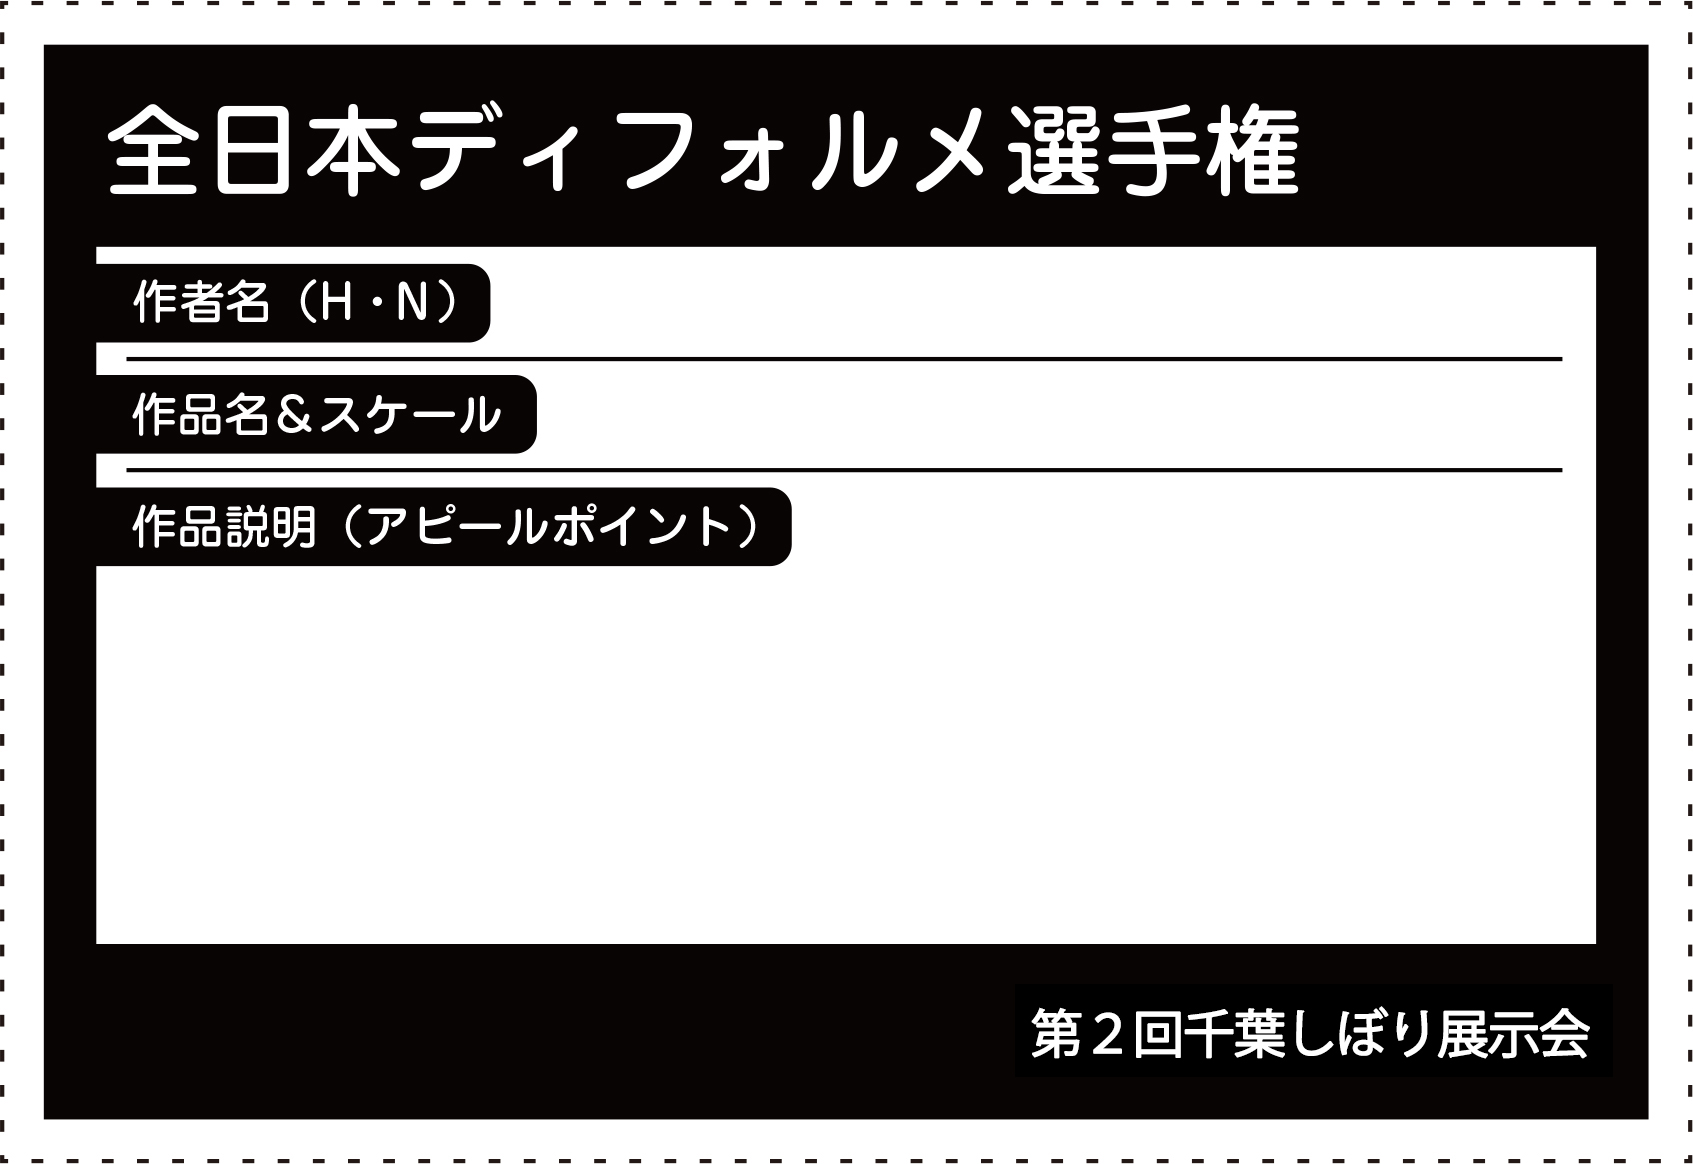 sd_card2.jpg